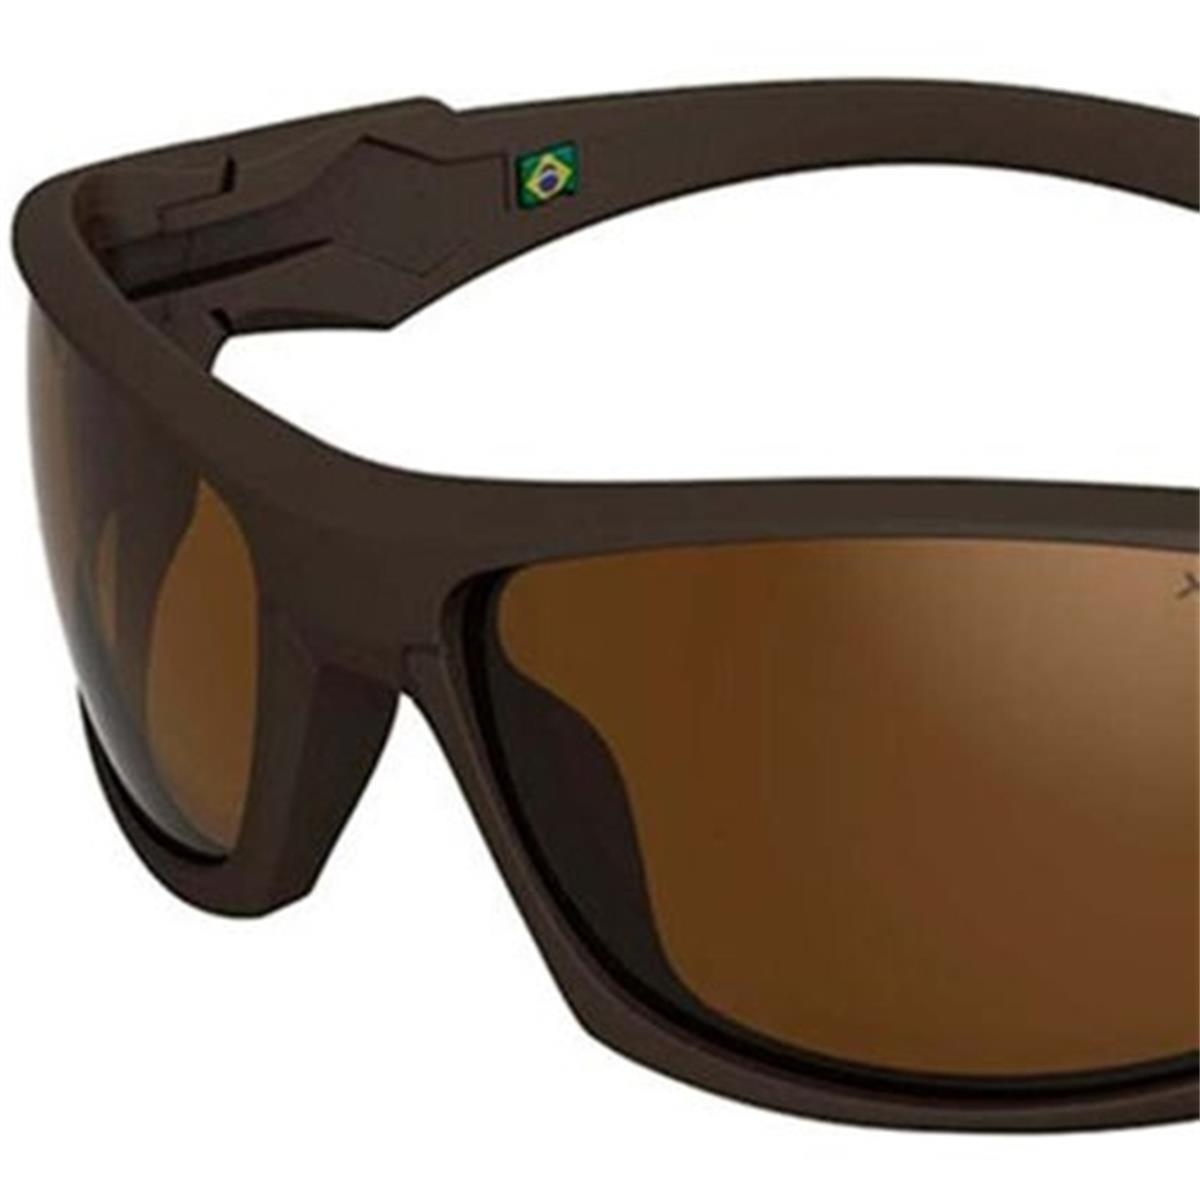 Óculos de Sol Marrom Lente Polarizada ITACARE 2 Mormaii b52dc95e6d